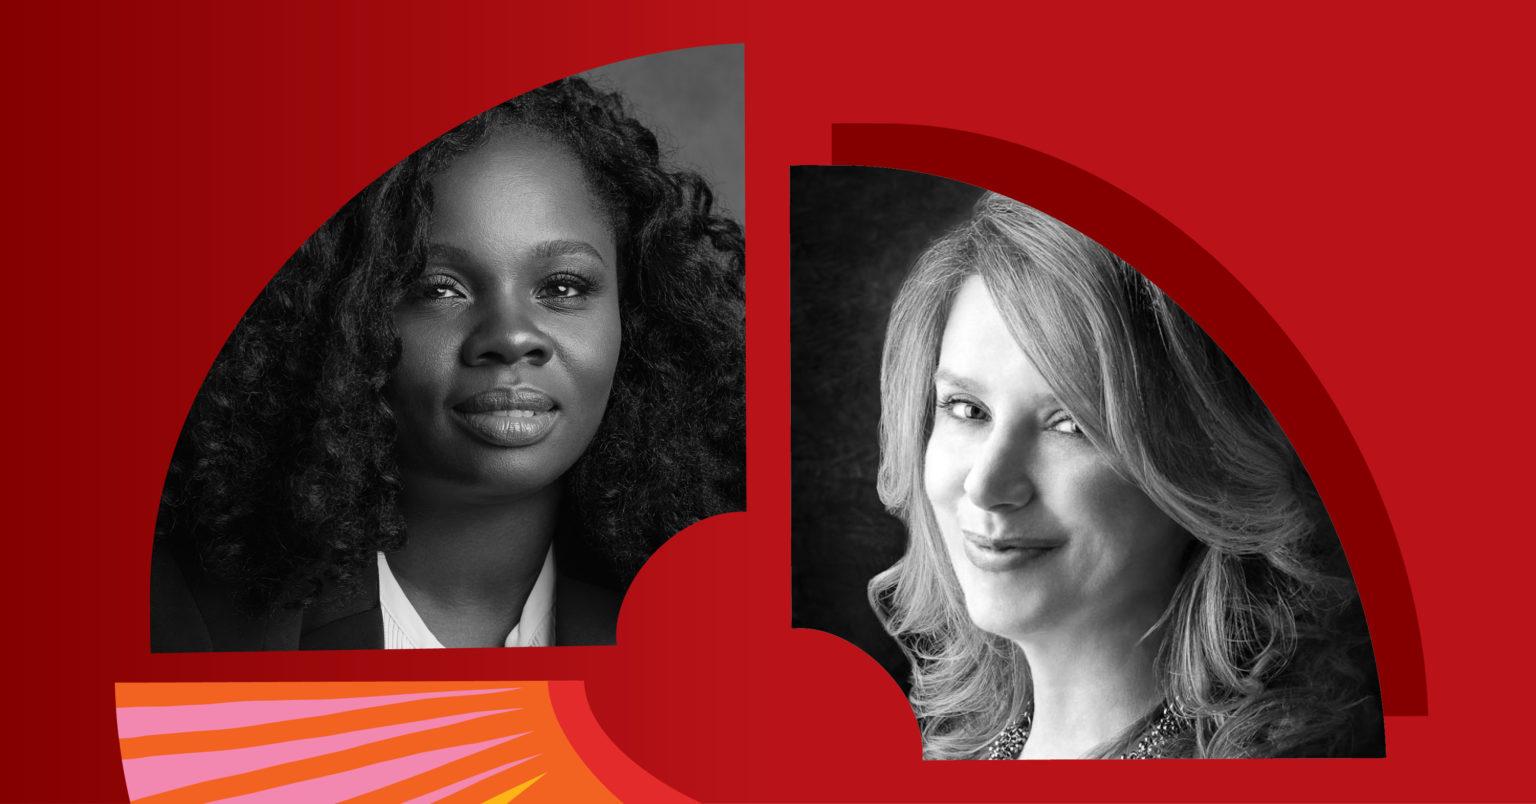 Toronto International Festival of Authors – Oct 22nd, 3:30-4:30pm